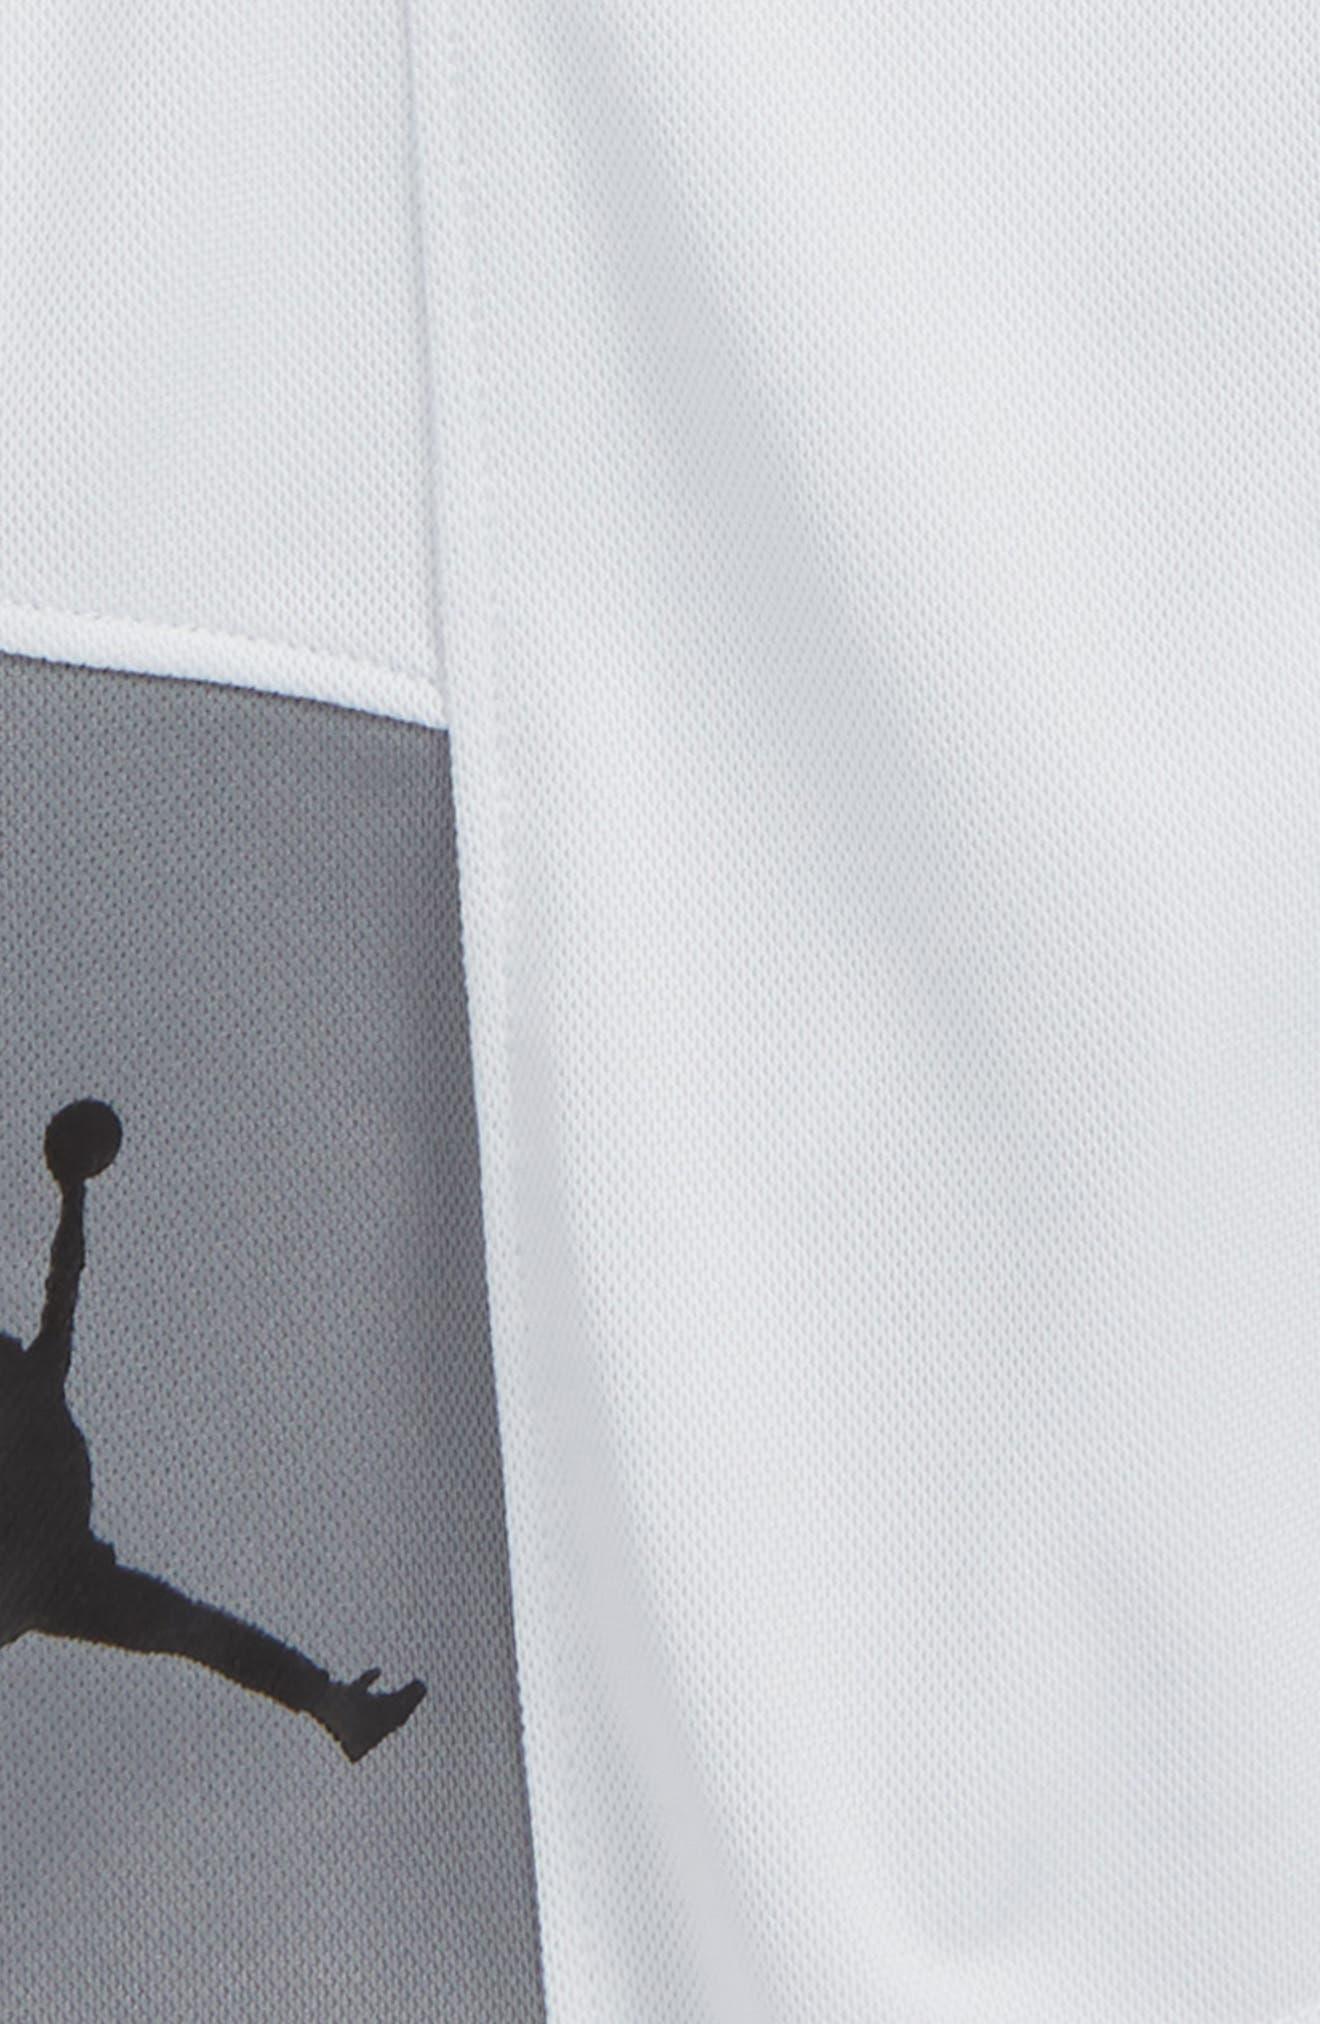 Jordan Elevate Shorts,                             Alternate thumbnail 2, color,                             Pure Platinum